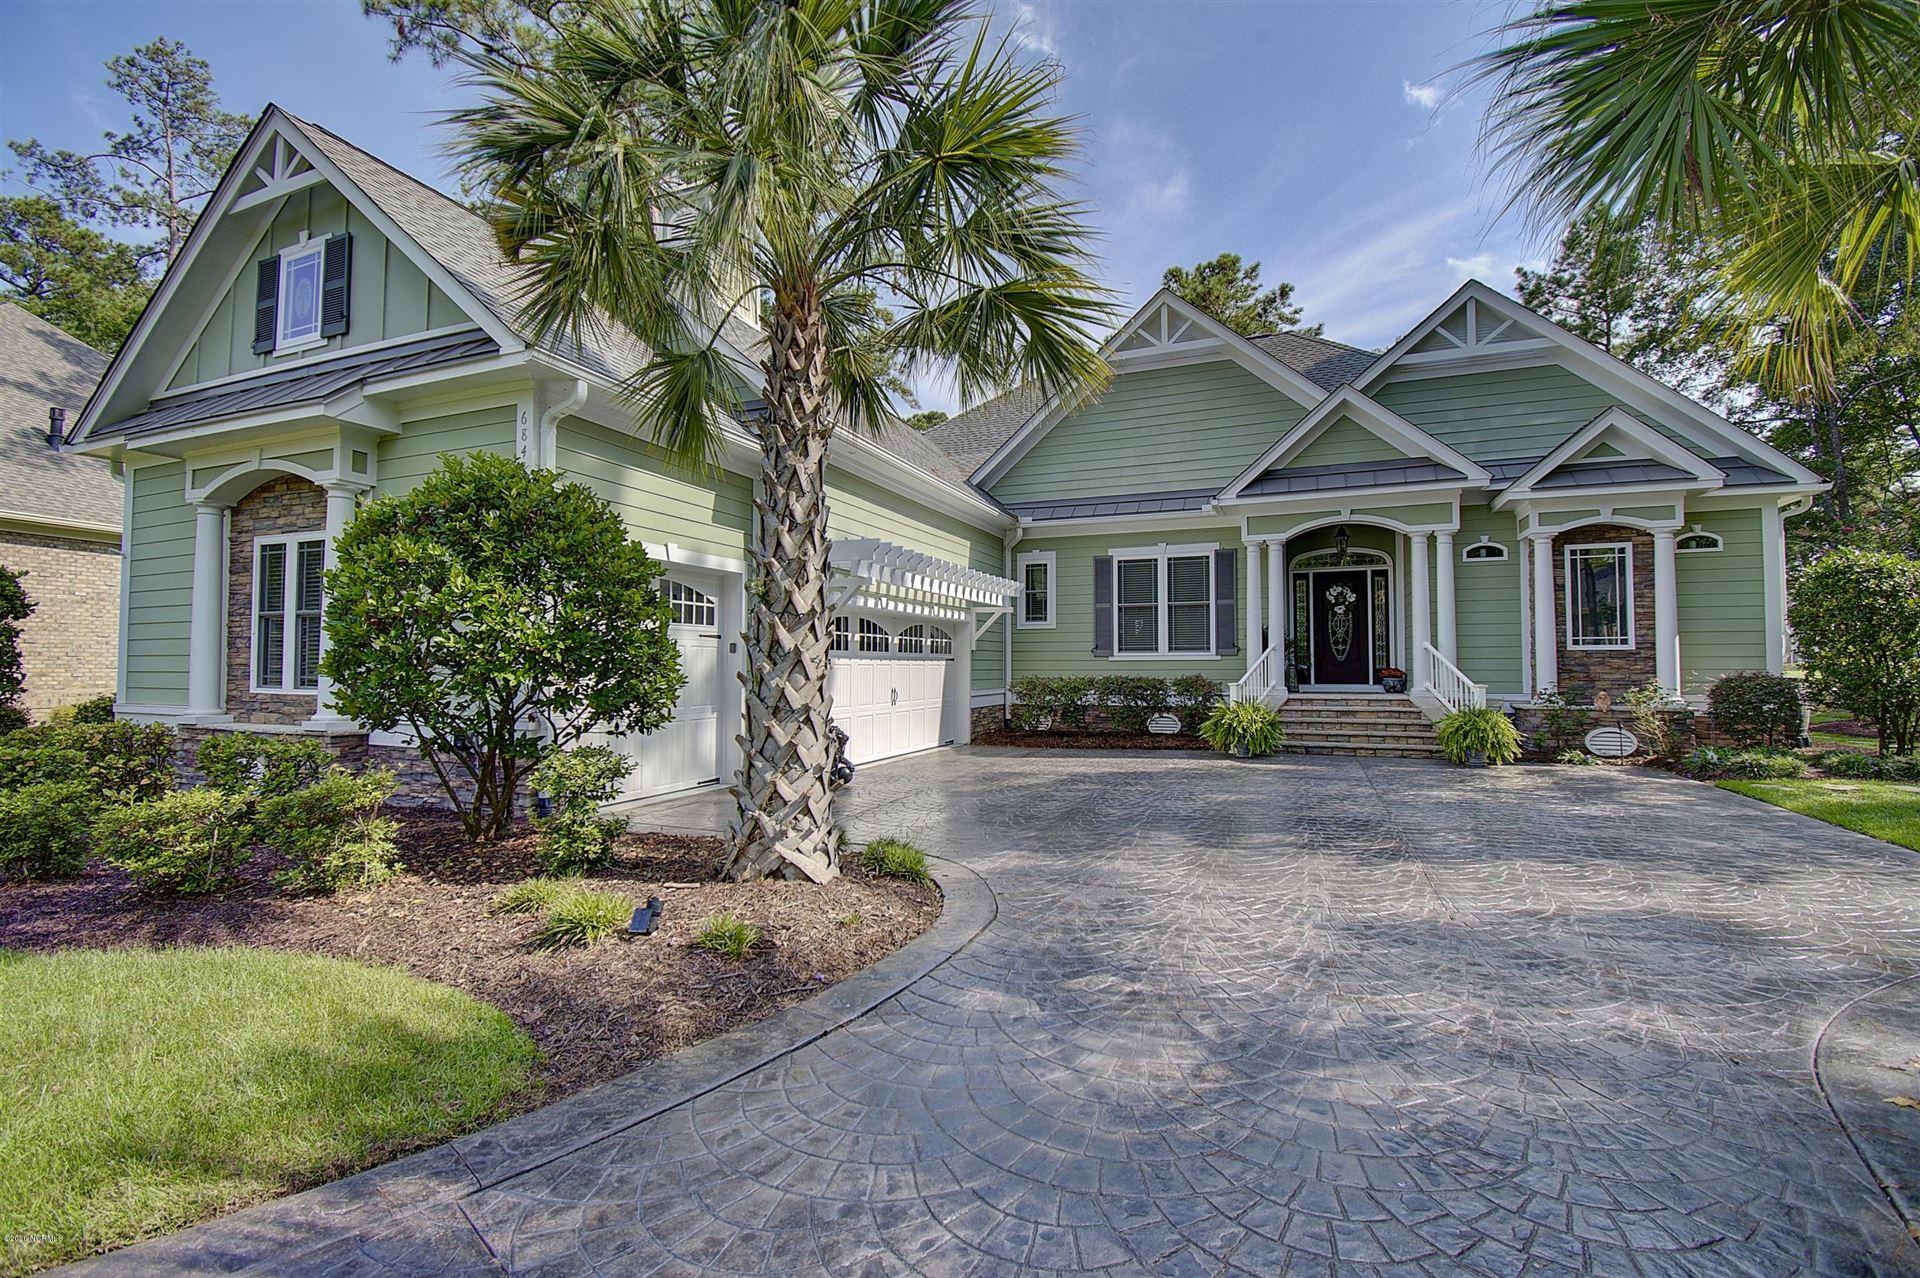 6841 Weeping Willow Place SW, Ocean Isle Beach, NC 28469 - MLS#: 100233803